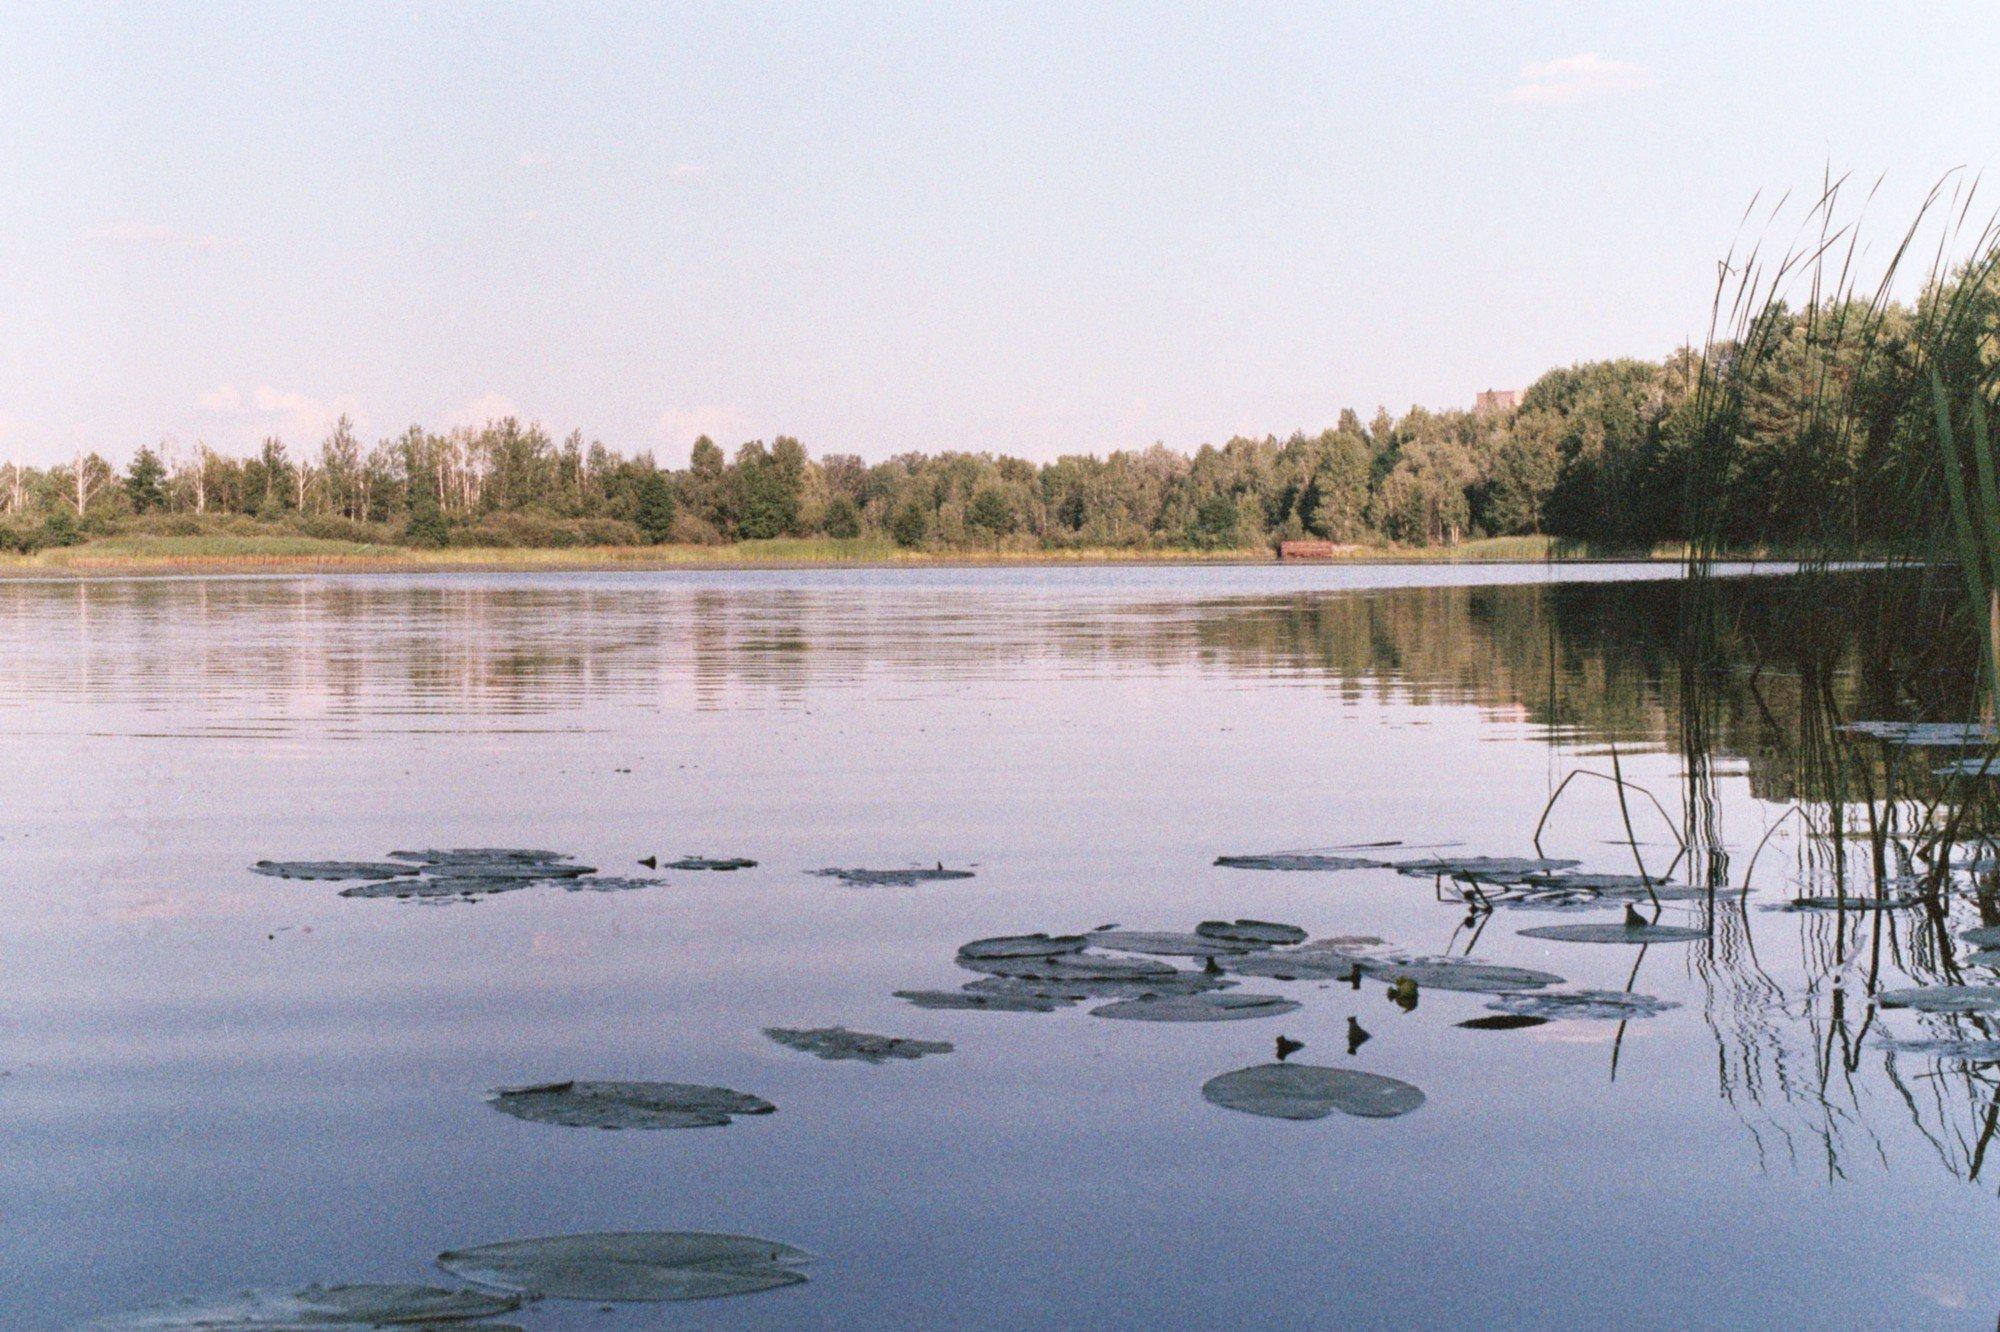 snaeking-into-chernobyl20 SNEAKING INTO CHERNOBYL